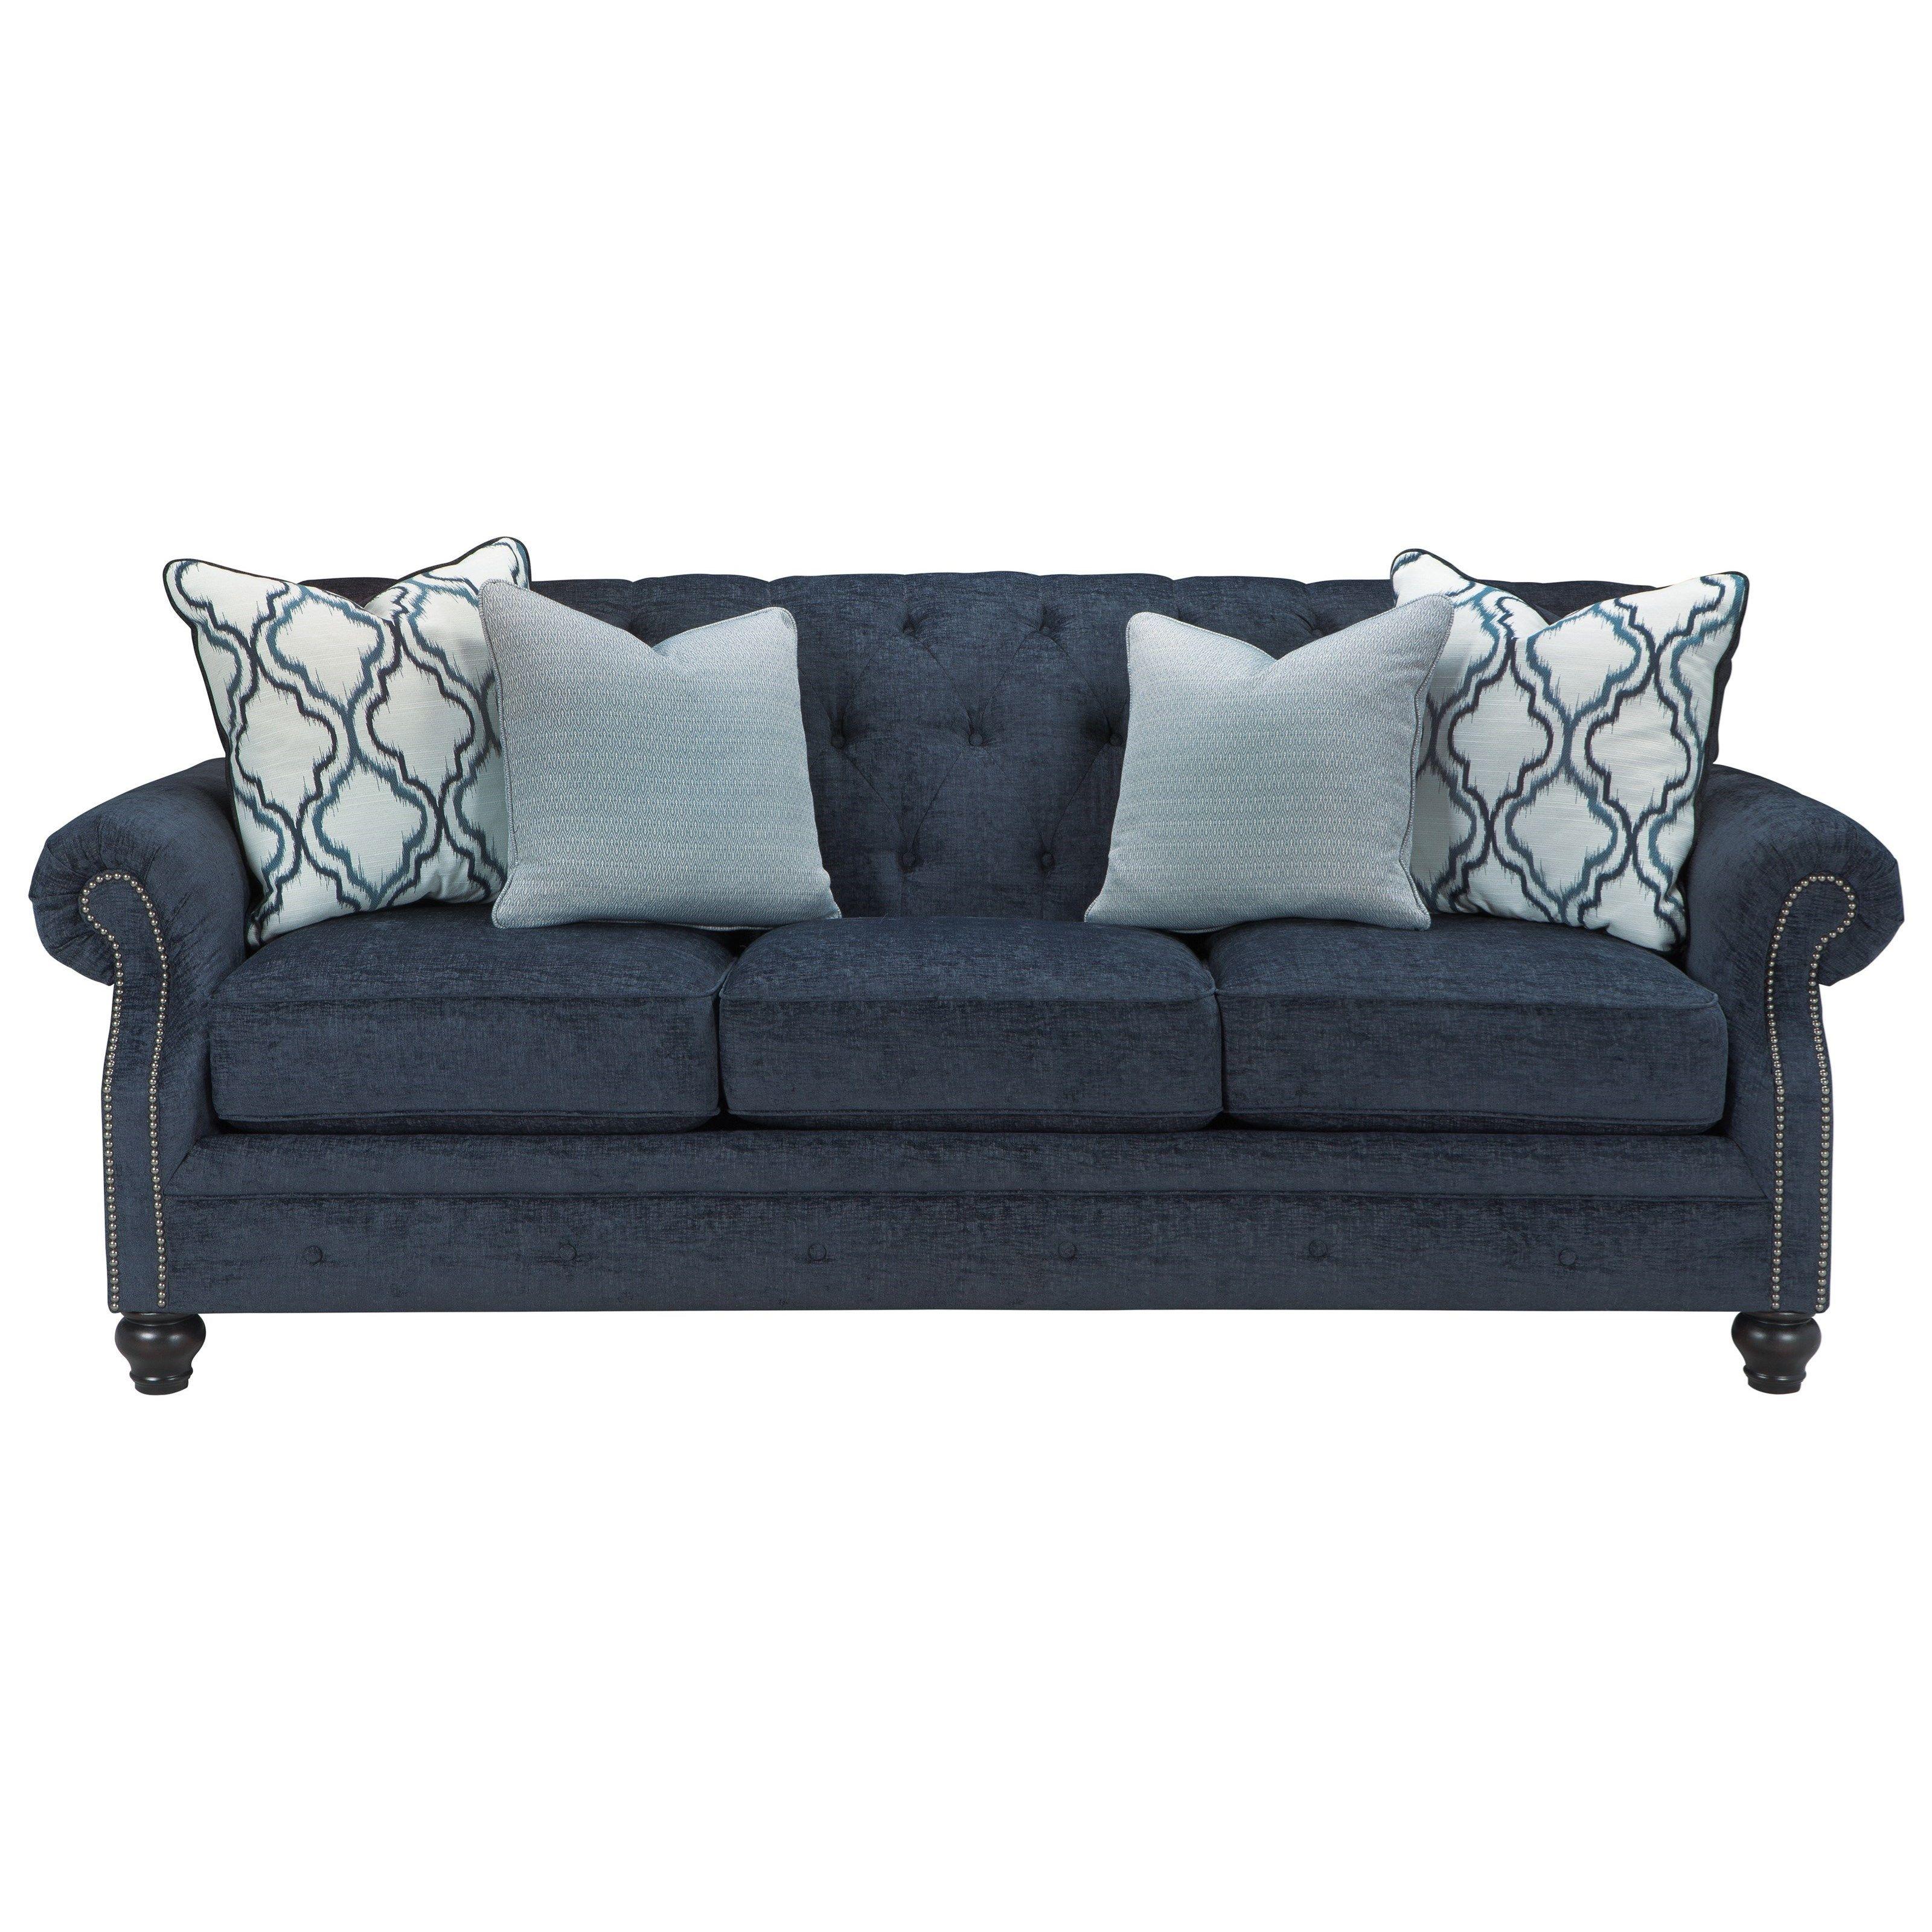 Lavernia Sofa By Benchcraft Navy Sofa Ashley Furniture Sofas Soft Throw Pillows